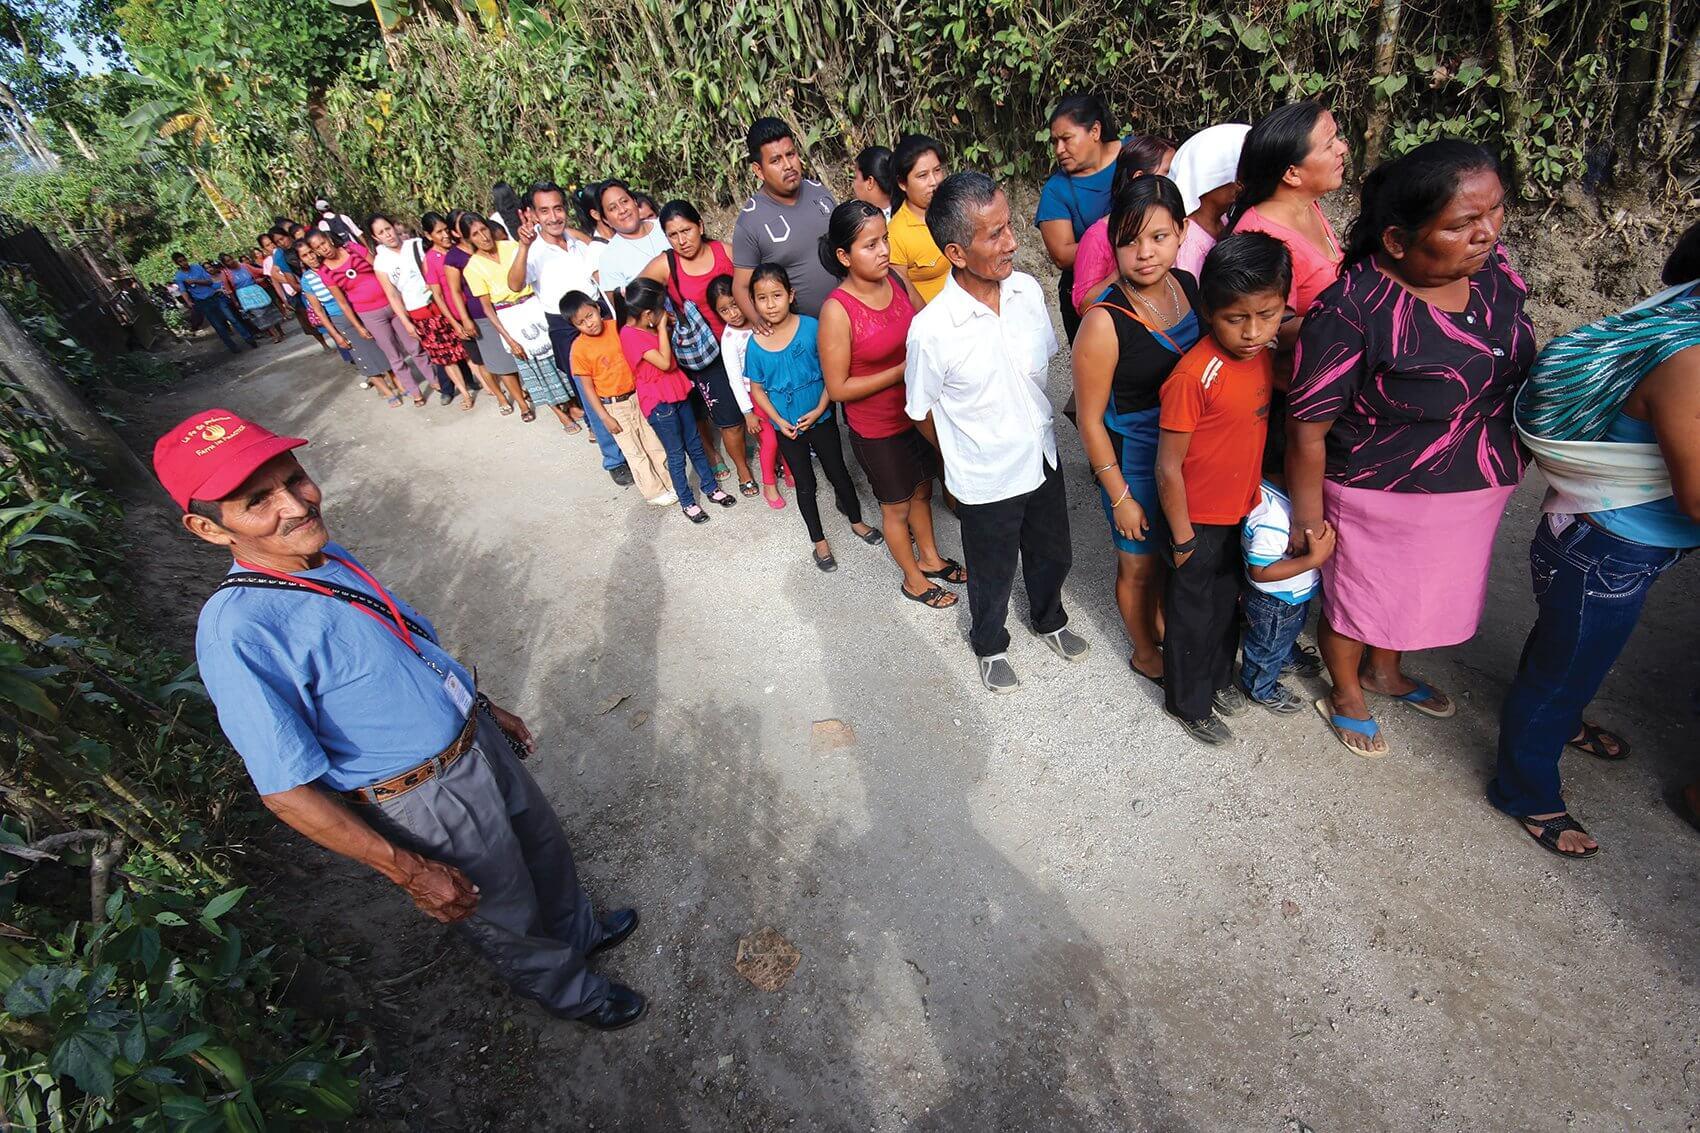 Patients wait in line in San Marcos, Guatemala. (Credit: Josie Johnson)